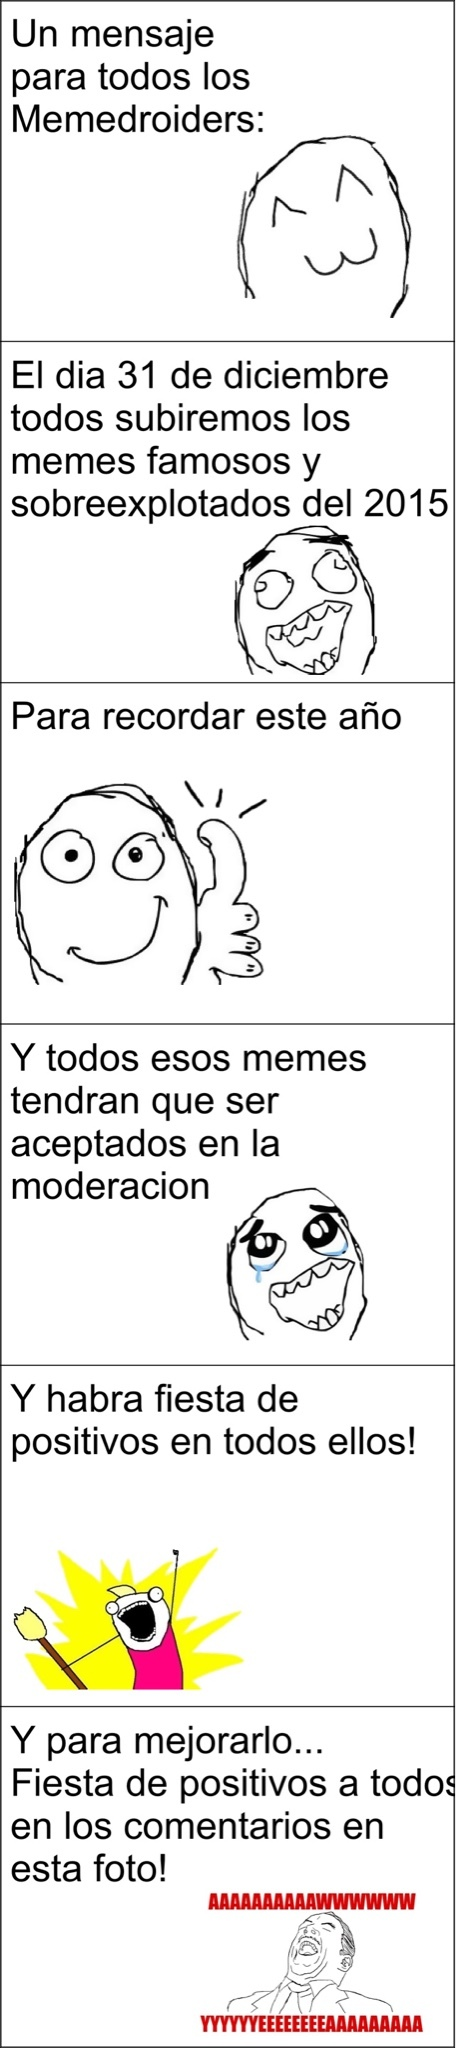 fiesta! - meme